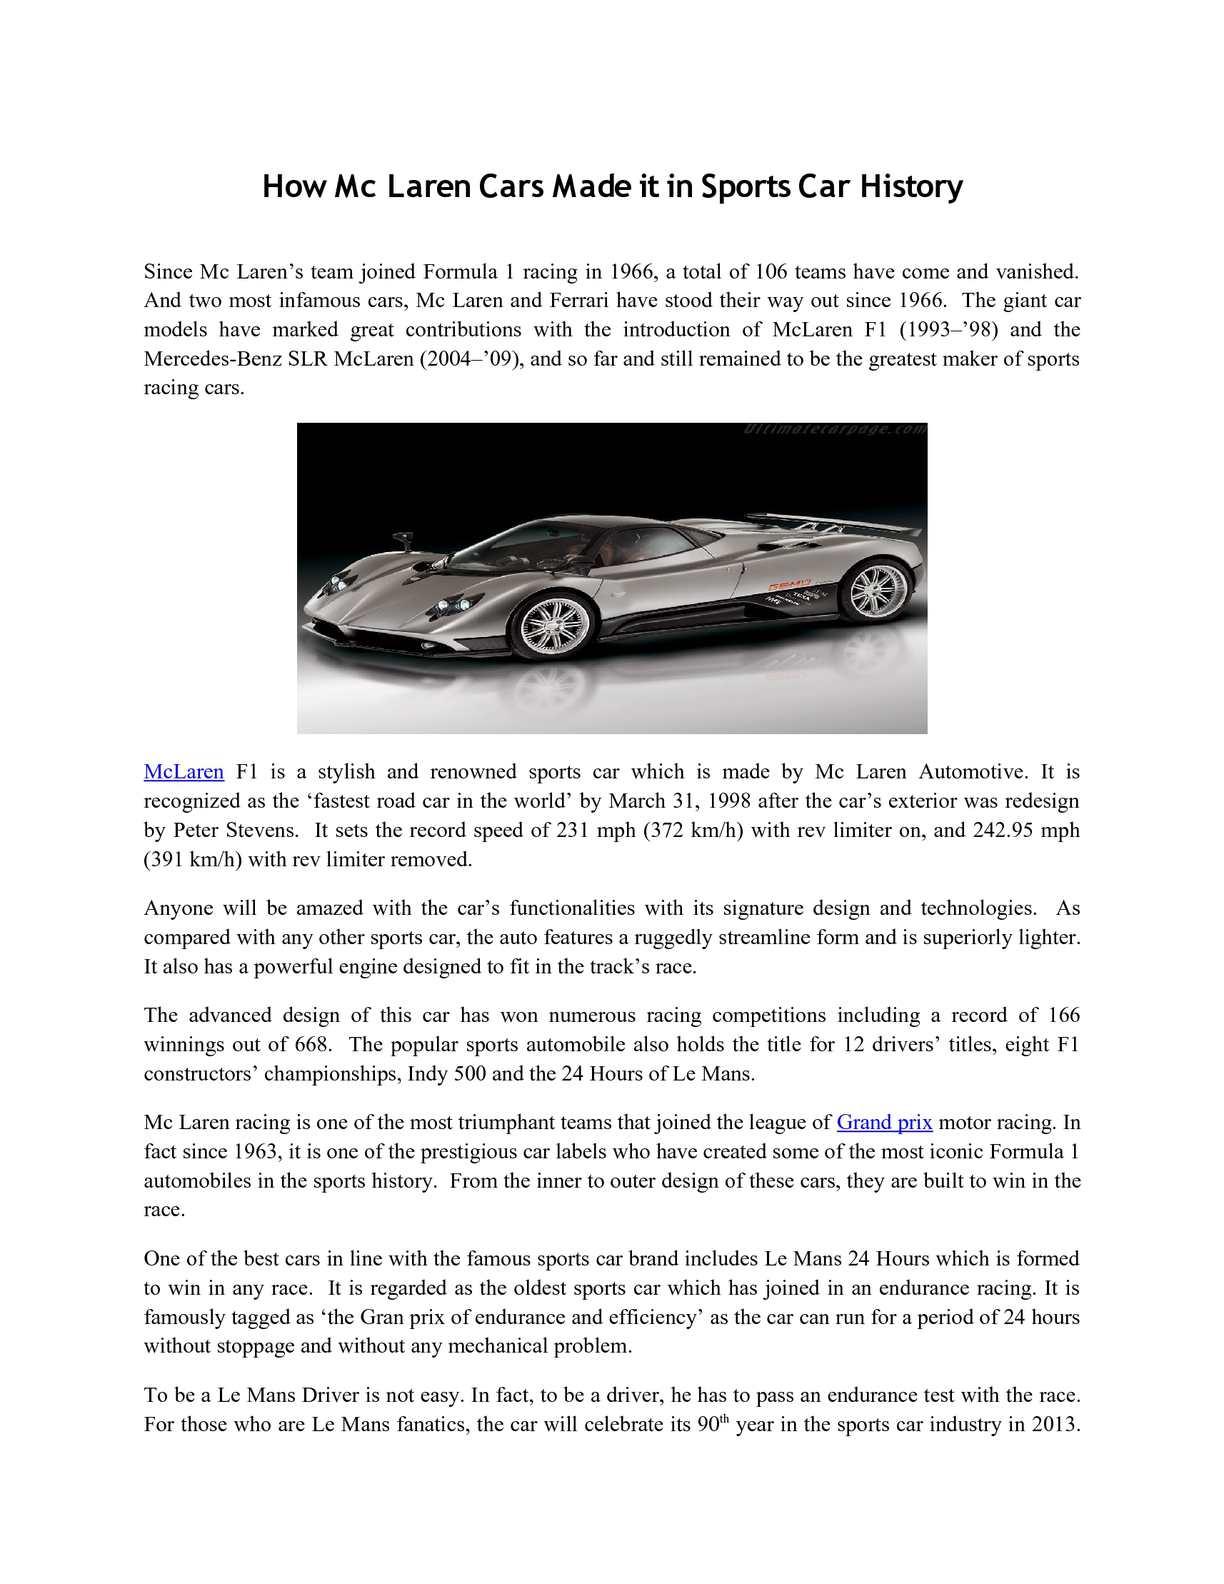 Calaméo - How Mc Laren Cars Made it in Sports Car History